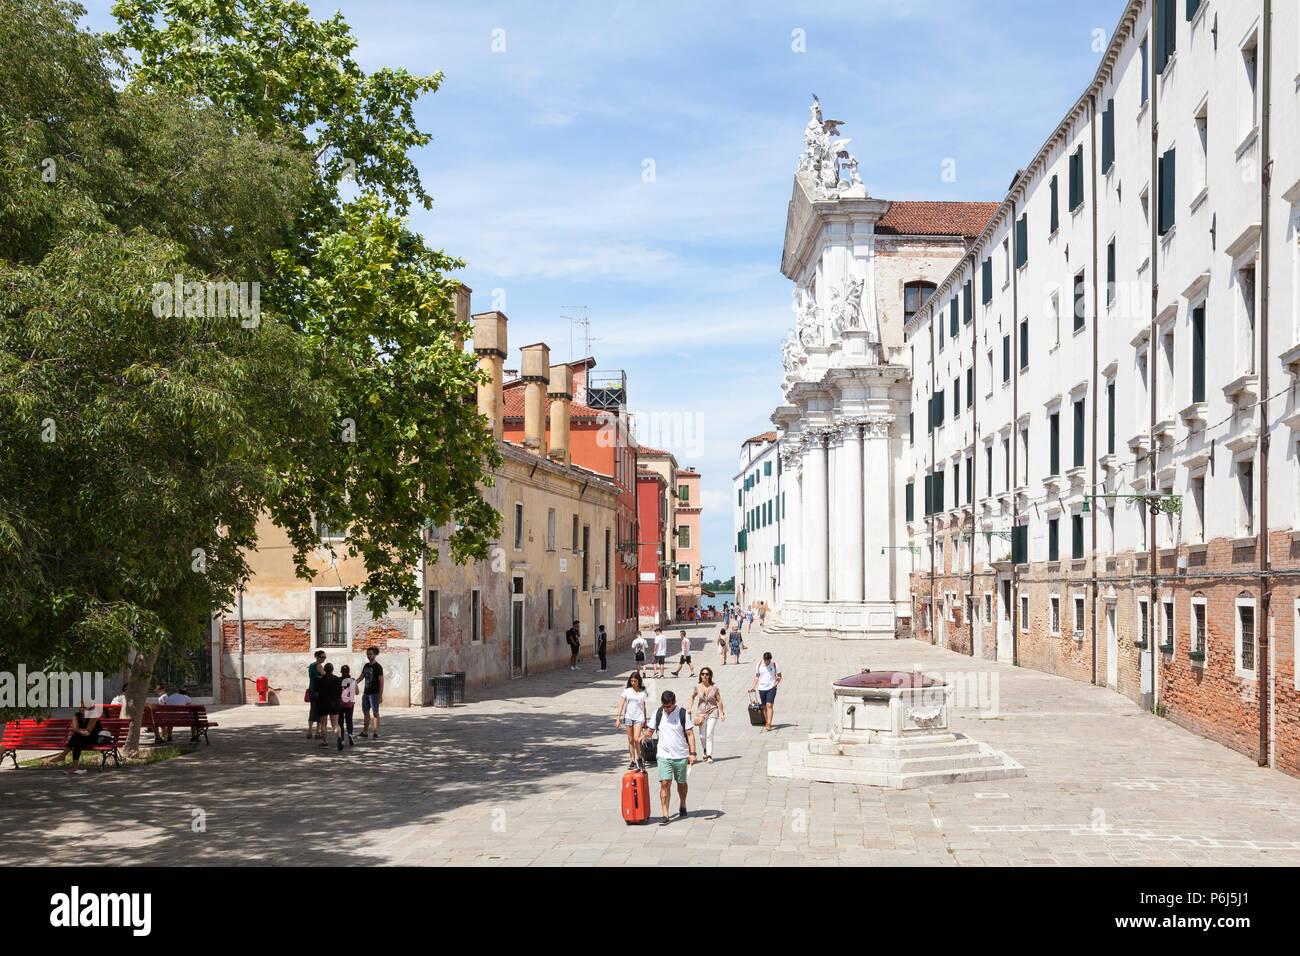 Gesuiti Church, Campo dei Gesuiti,  Cannaregio, Venice, Veneto, Italy with tourists walking with luggage past the ancient pozzo (well head) - Stock Image